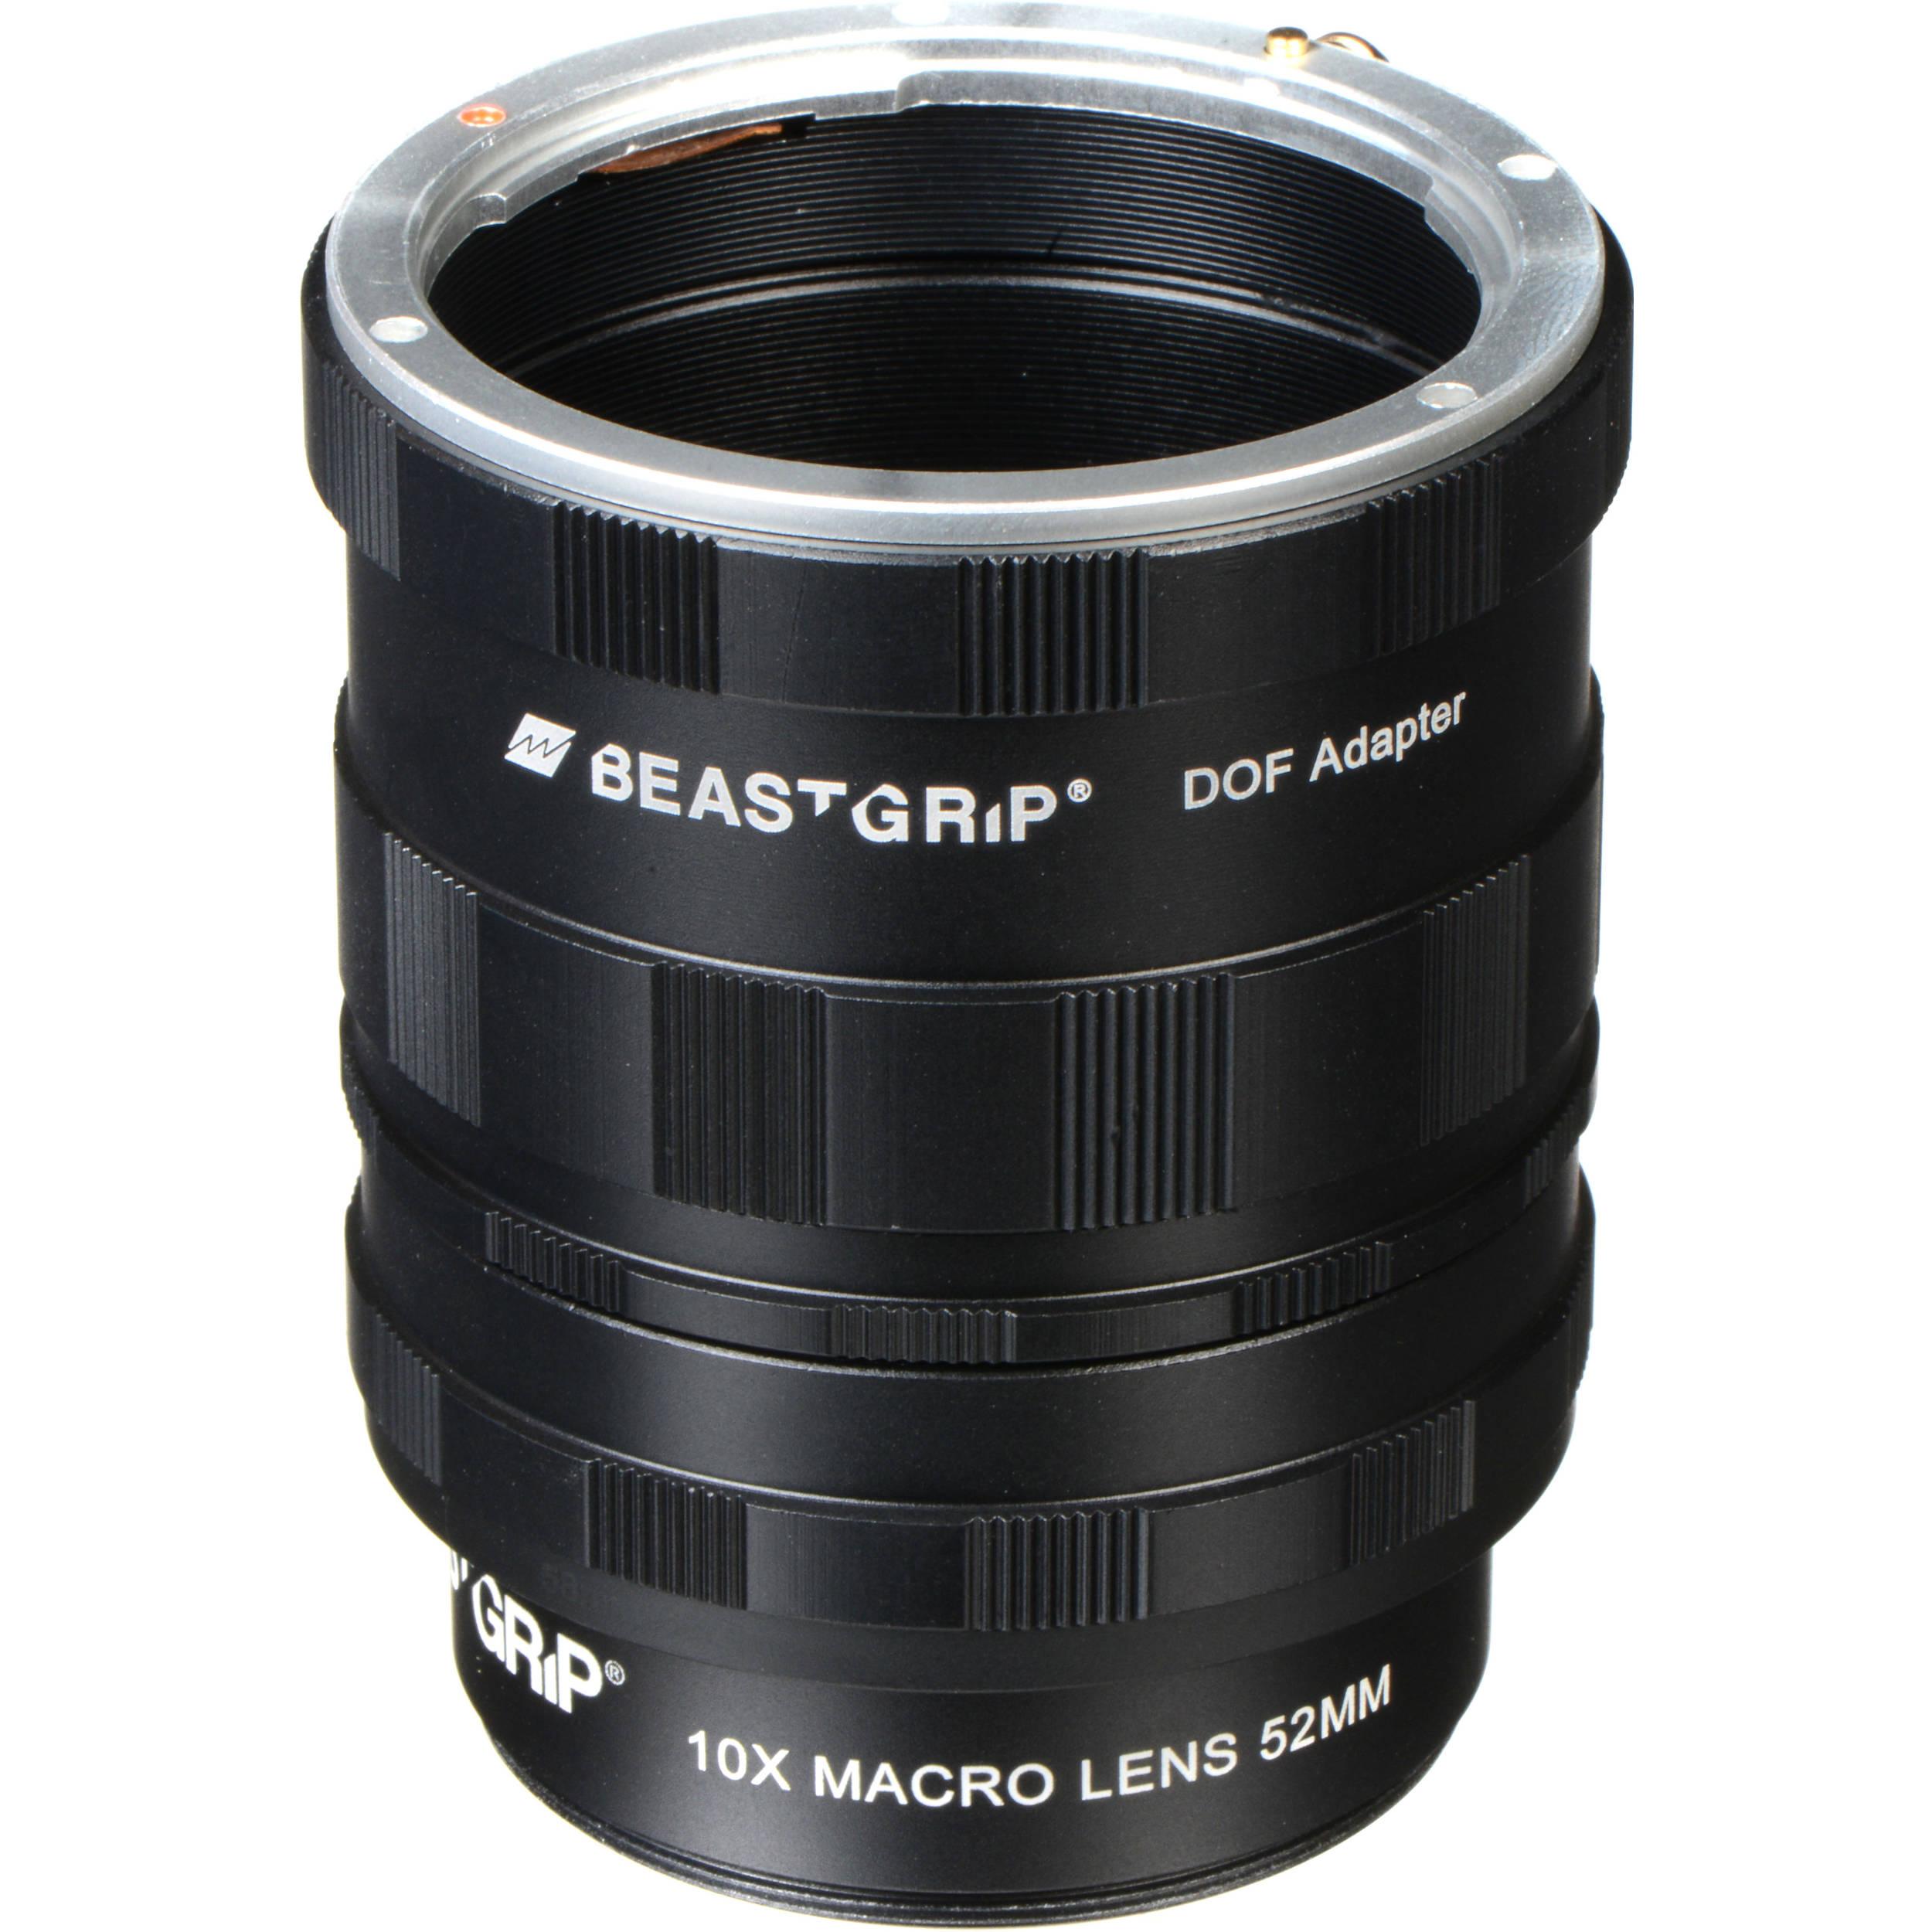 Beastgrip DOF Adapter BG0061SP5104 B&H Photo Video